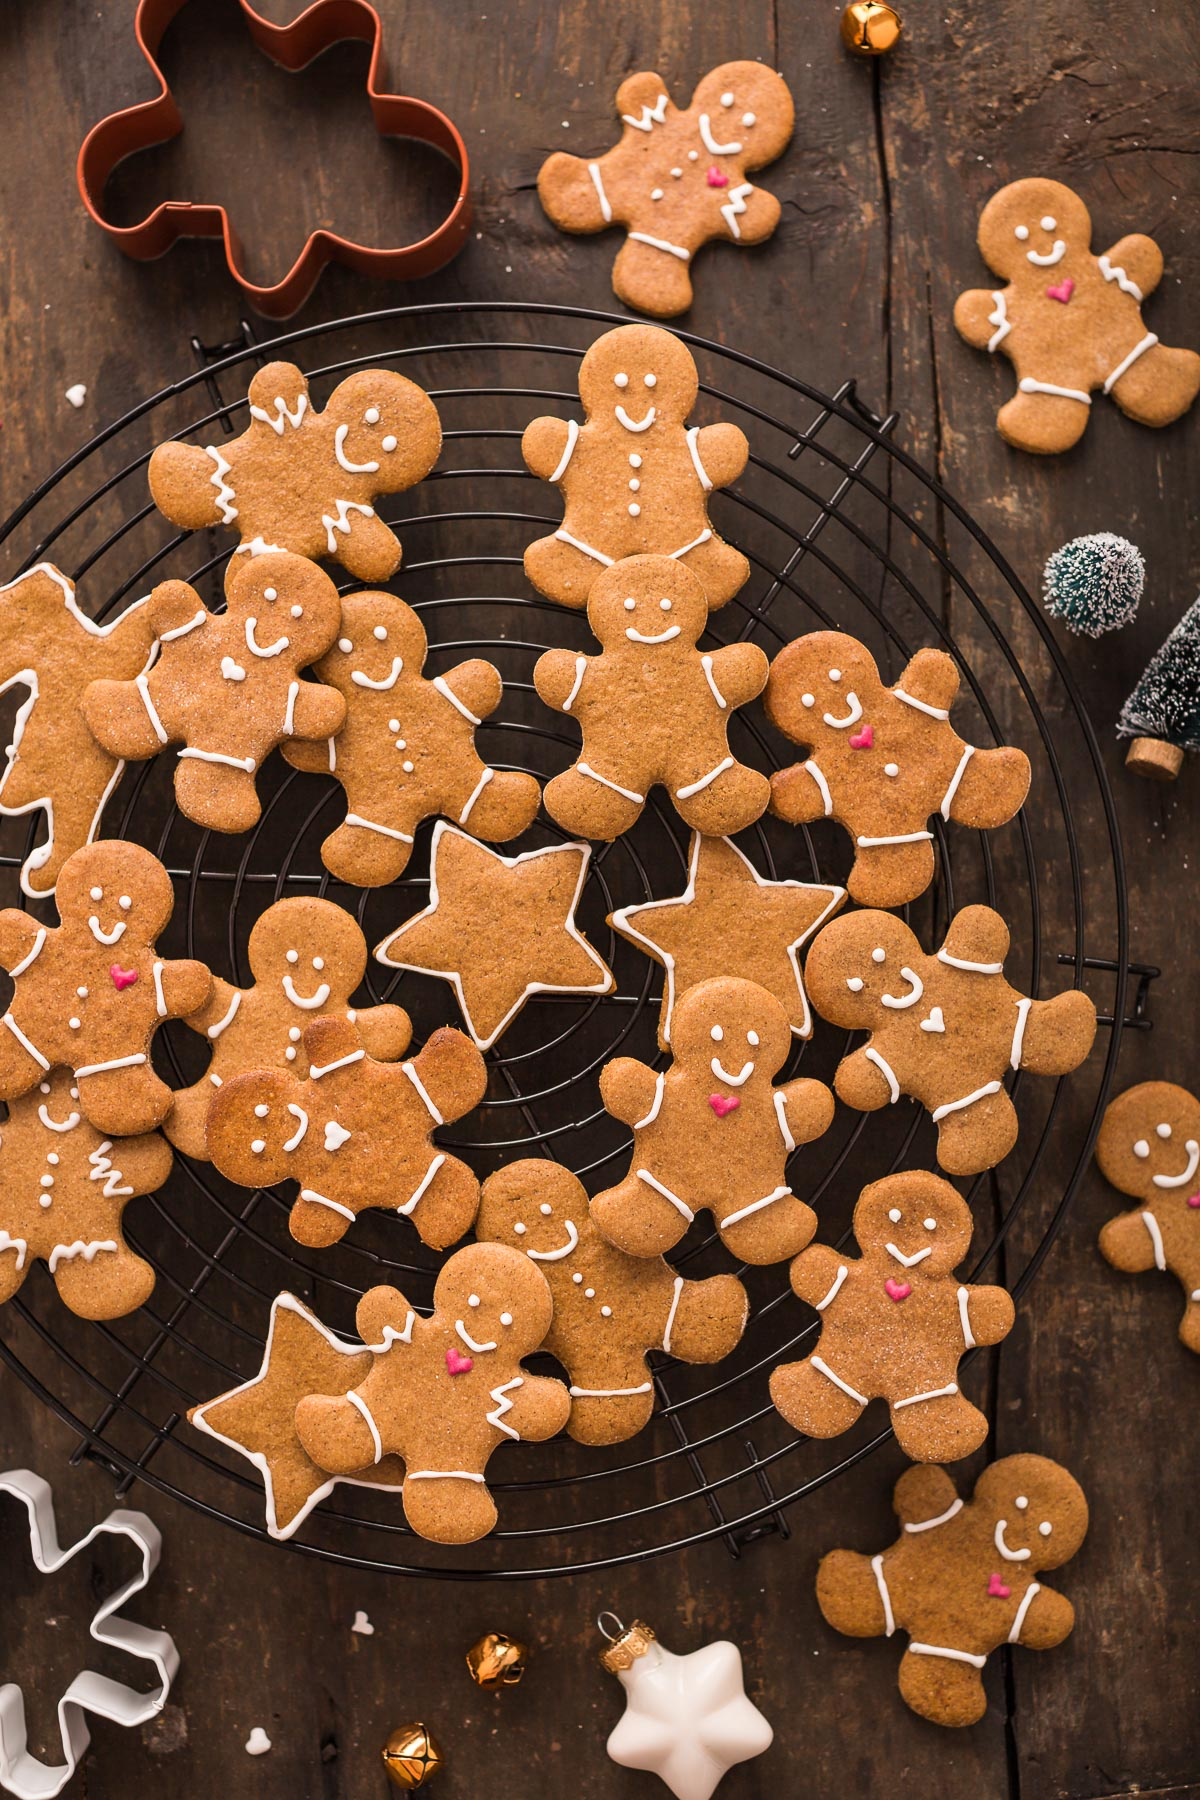 delicious vegan gingerbread man vegani - biscotti pan di zenzero vegani croccanti leggeri e friabili #vegan #gingerbread man #cookies senza burro biscotti di Natale